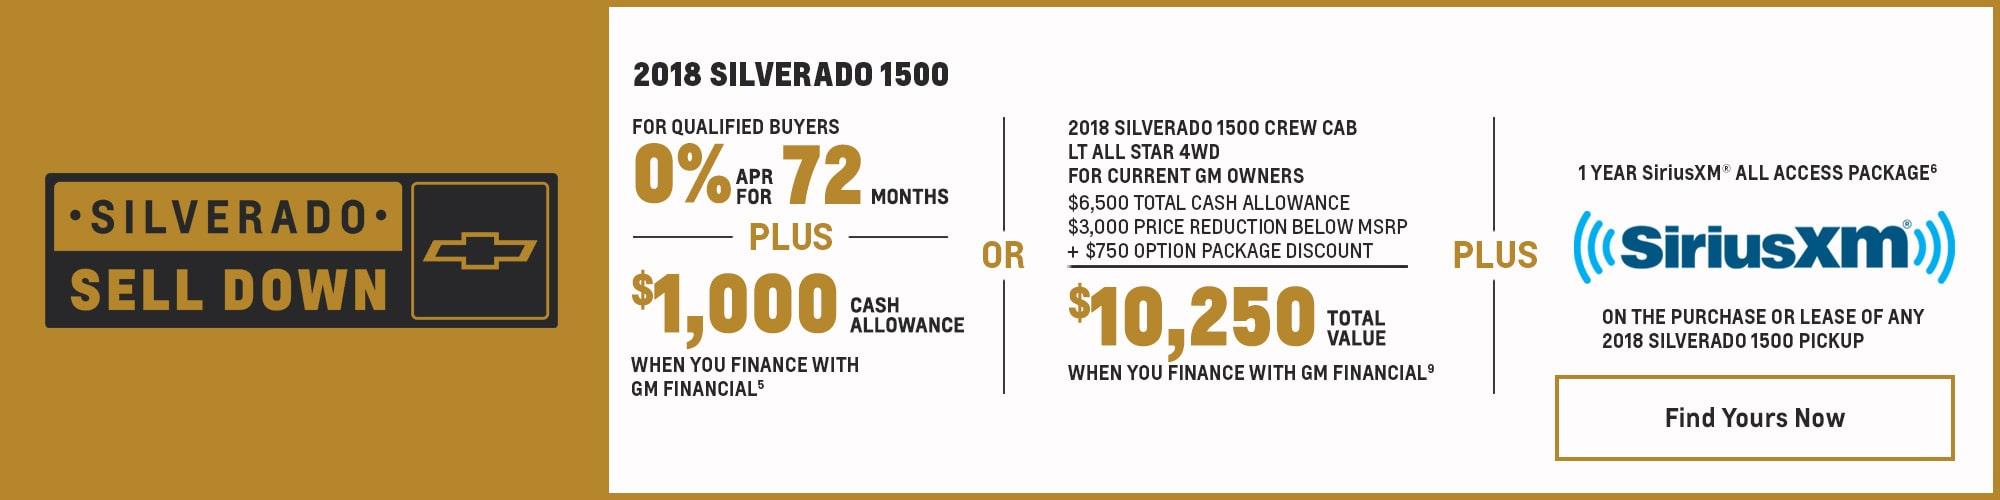 2018 Silverado 1500: 0% APR for 72 Months Plus $1,000 Cash Allowance Plus 1 Year Sirius XM All Access Package